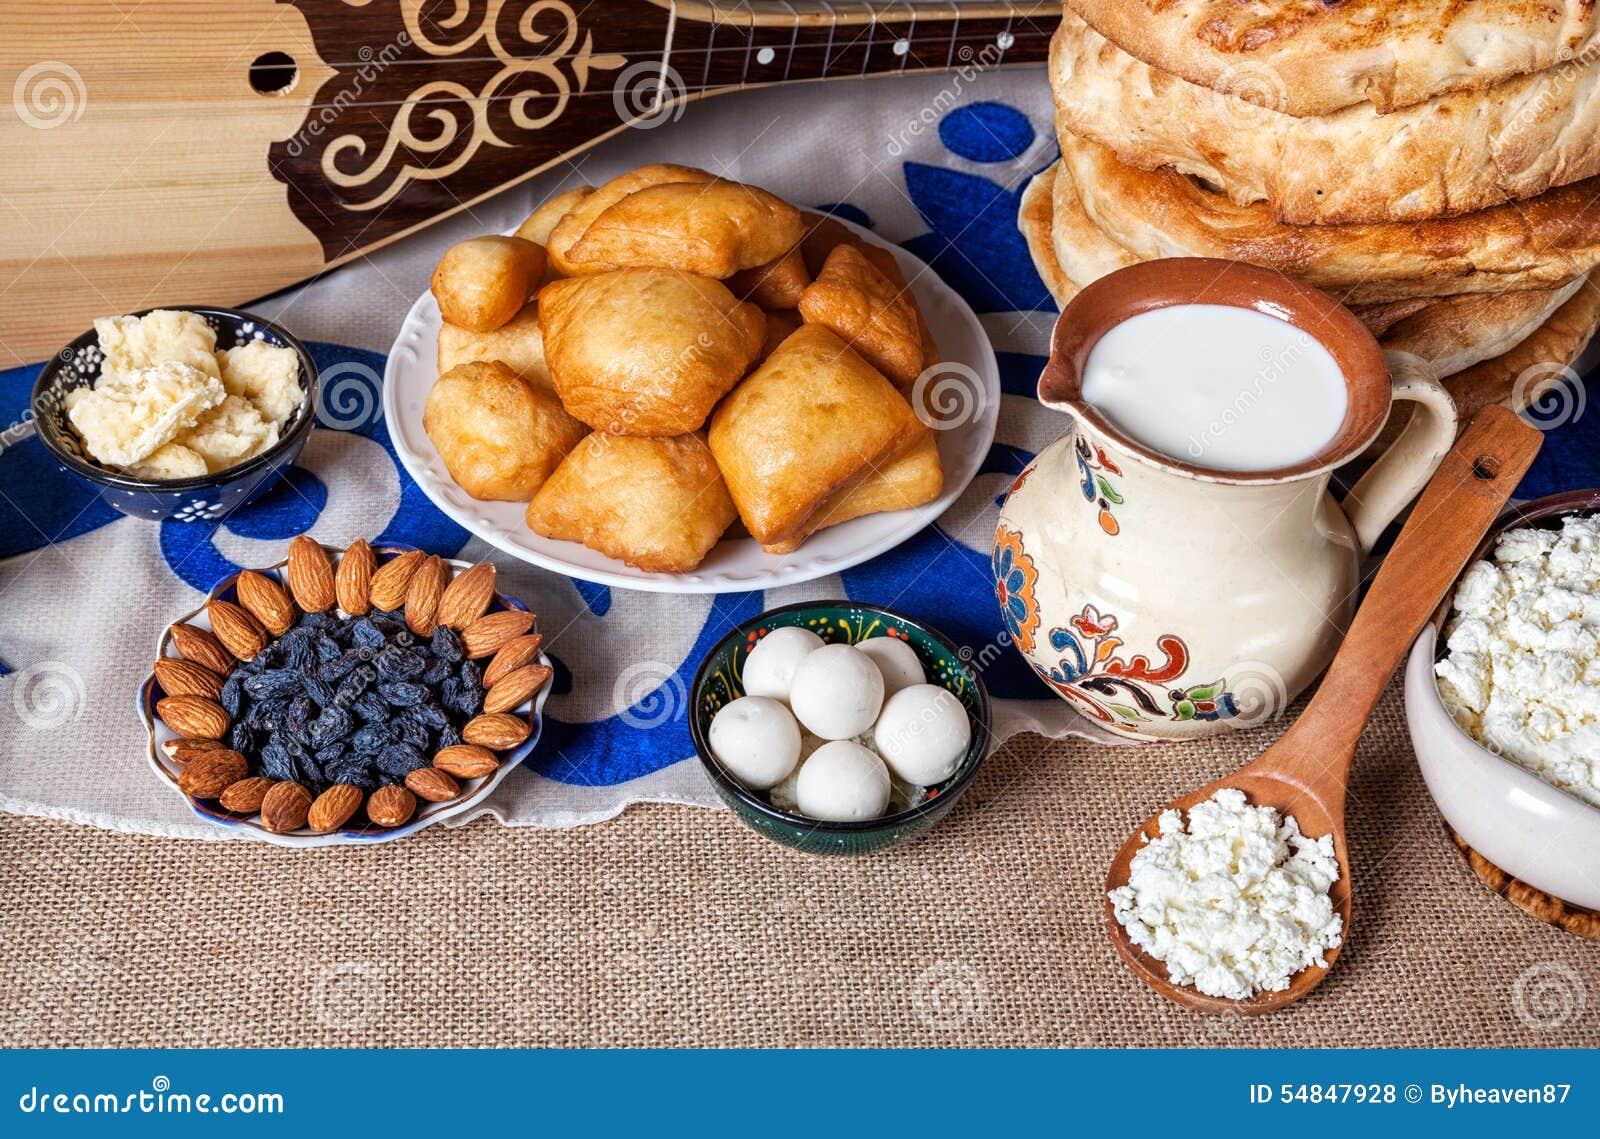 Kazakh food stock photo image 54847928 for Cuisine instrument